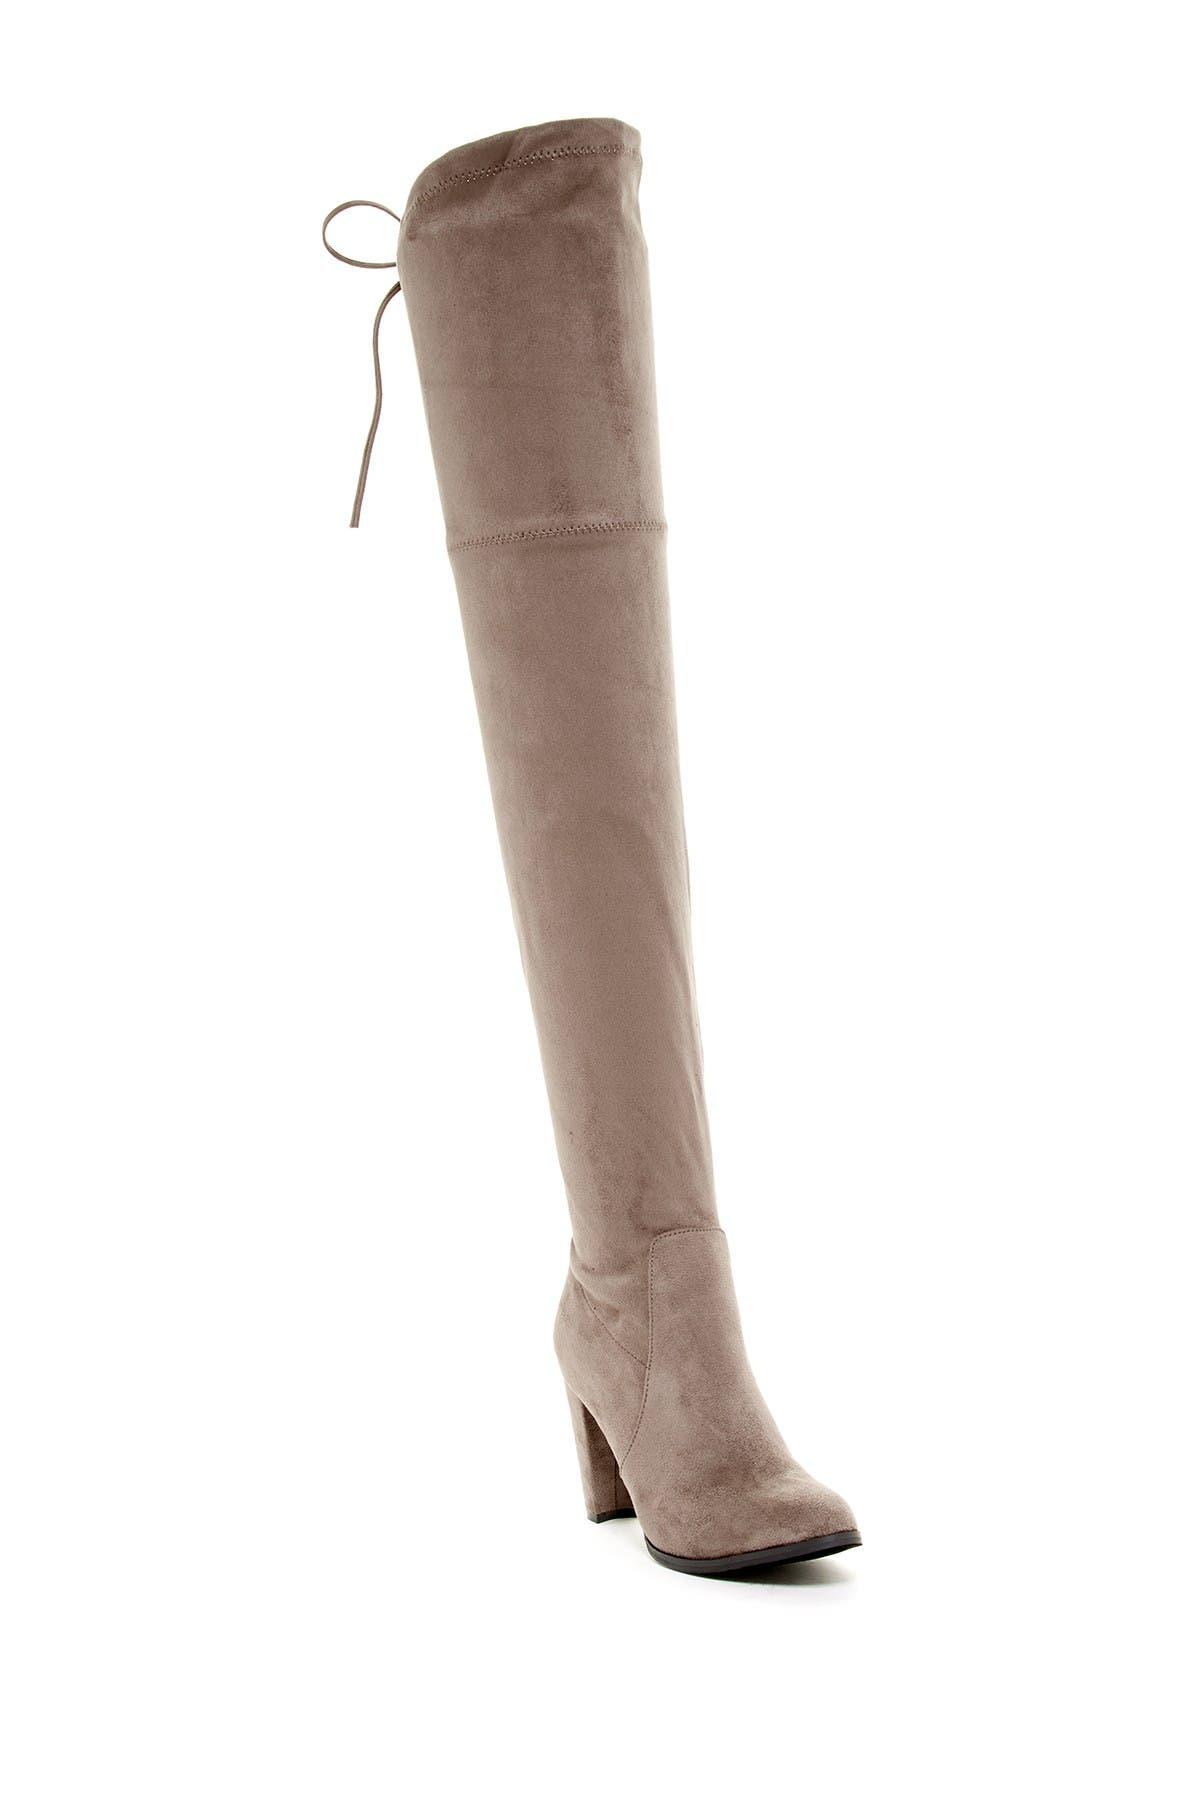 Image of Catherine Catherine Malandrino Sorcha Over-the-Knee Boot